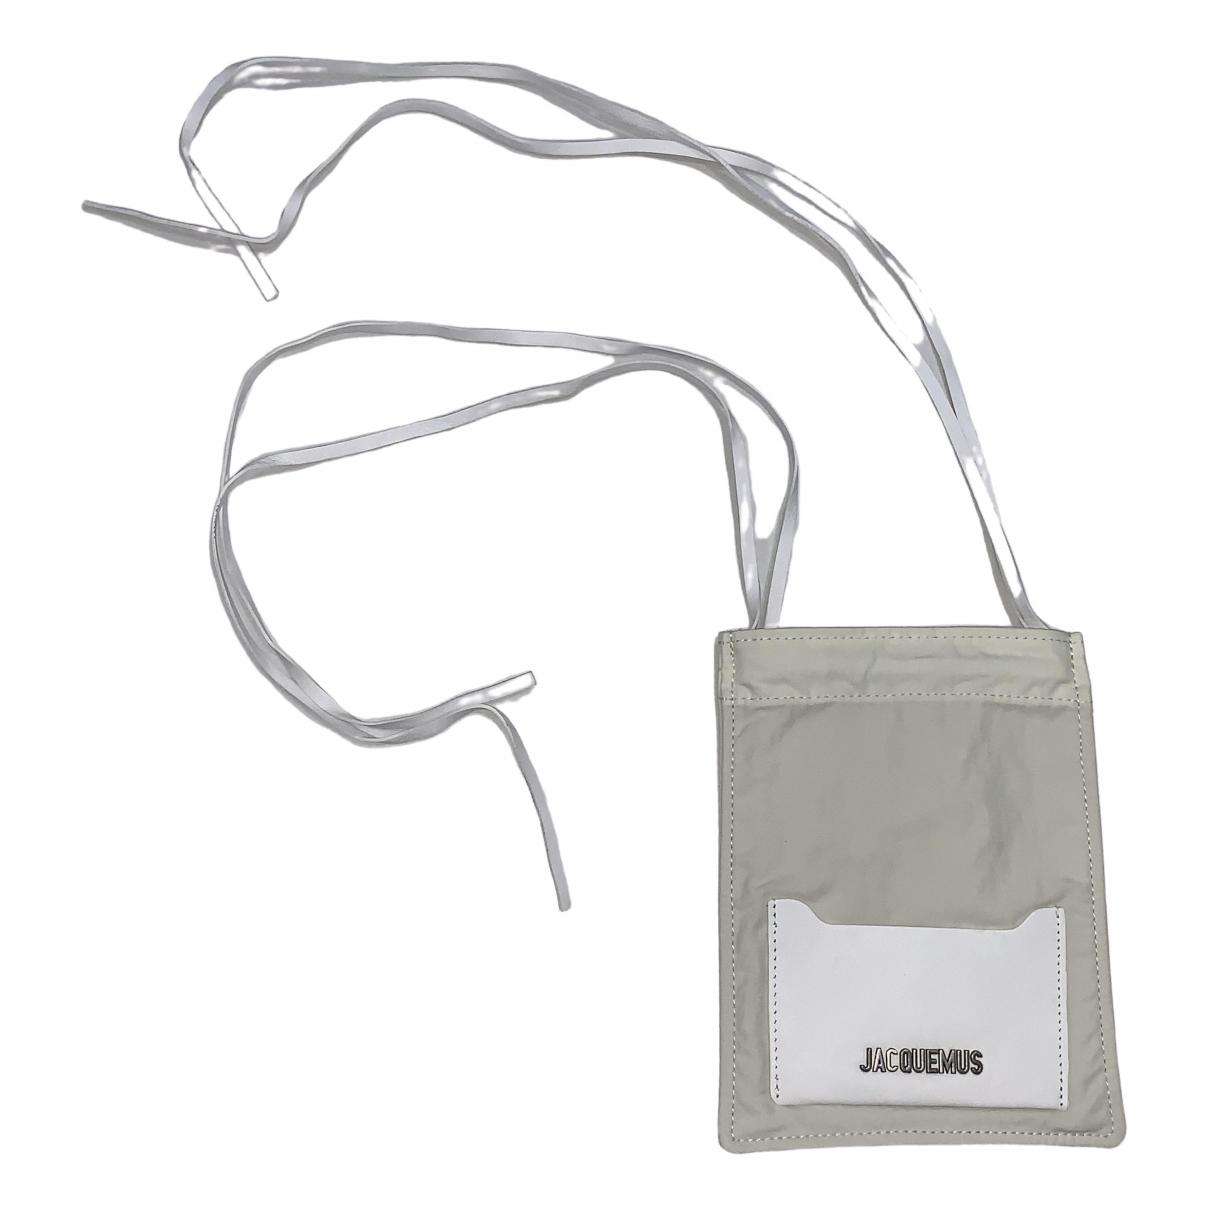 Jacquemus Le Minot Ecru Cloth Small bag, wallet & cases for Men N